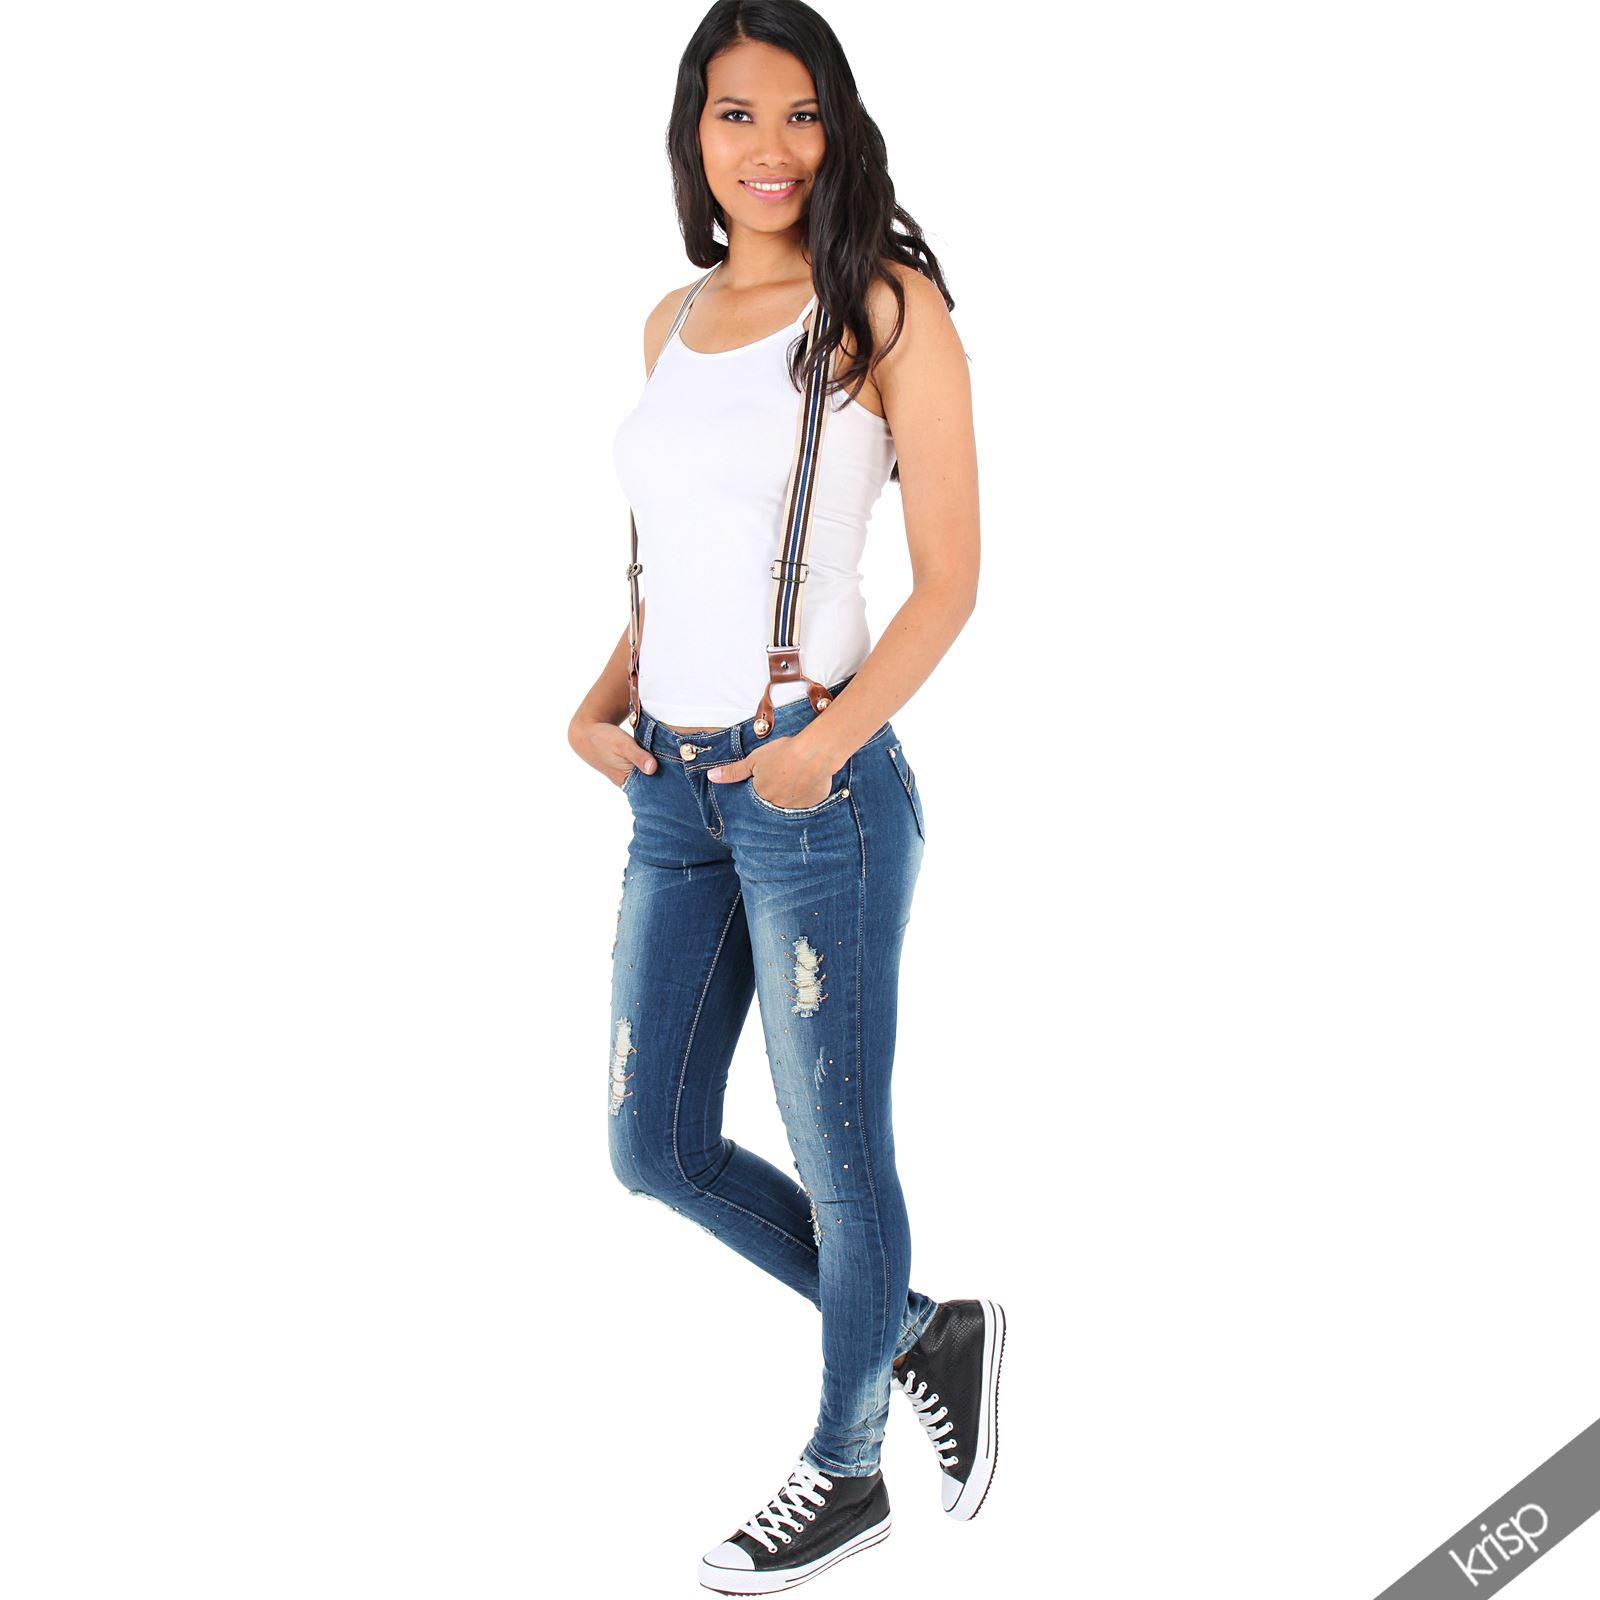 femme pantalon bretelles amovibles jean slim strass et d chir moulant ebay. Black Bedroom Furniture Sets. Home Design Ideas